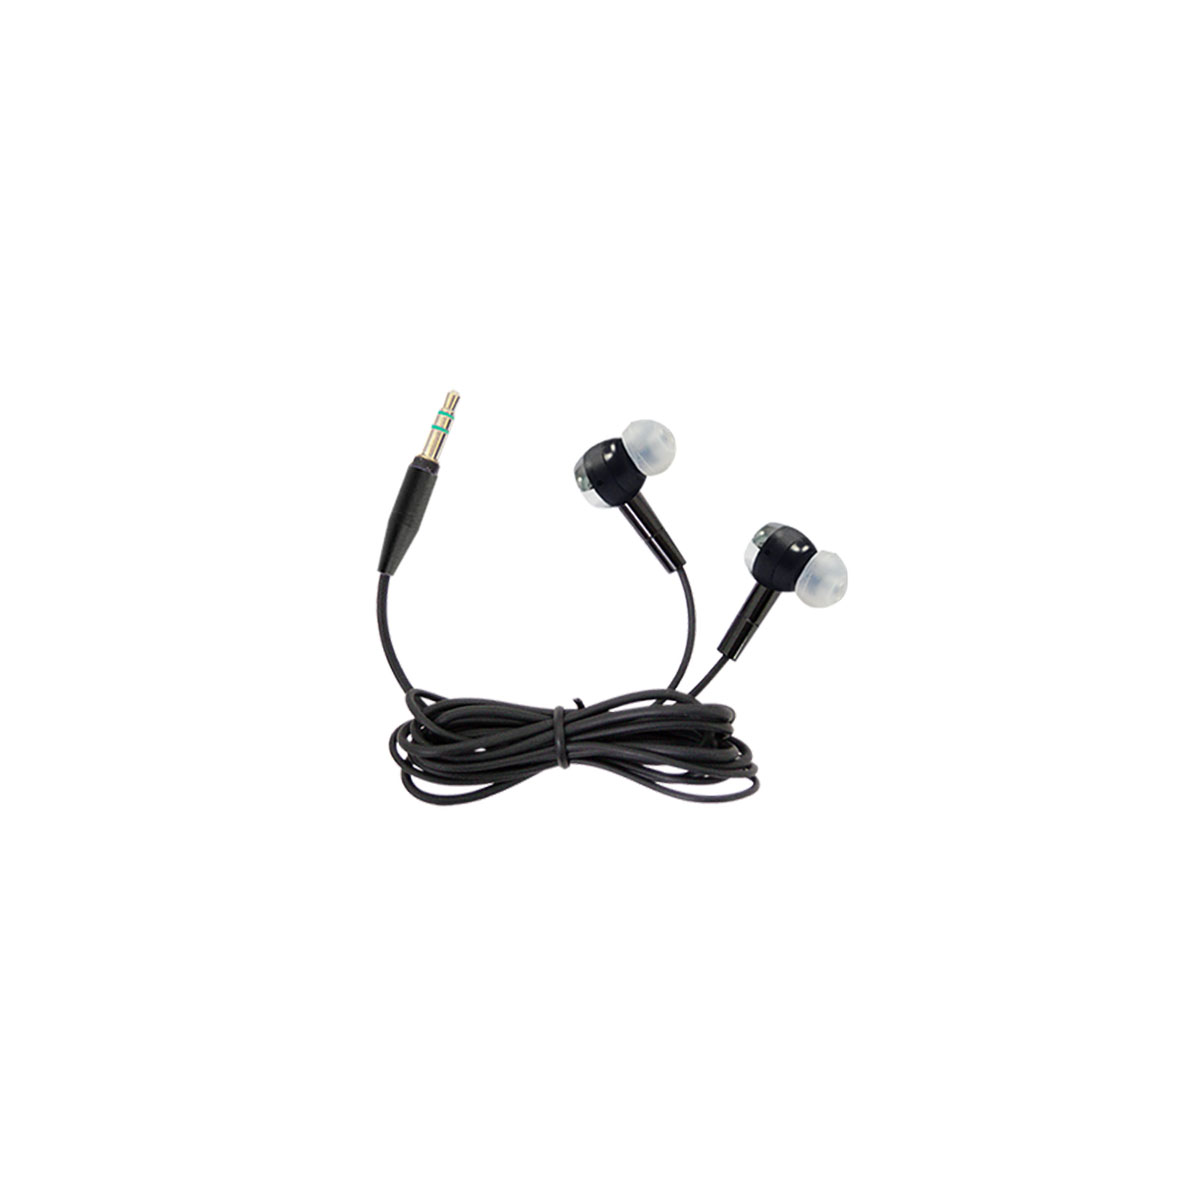 Receptor s/ Fio c/ Fone de Ouvido In-ear - C IE 6 UR Compatível